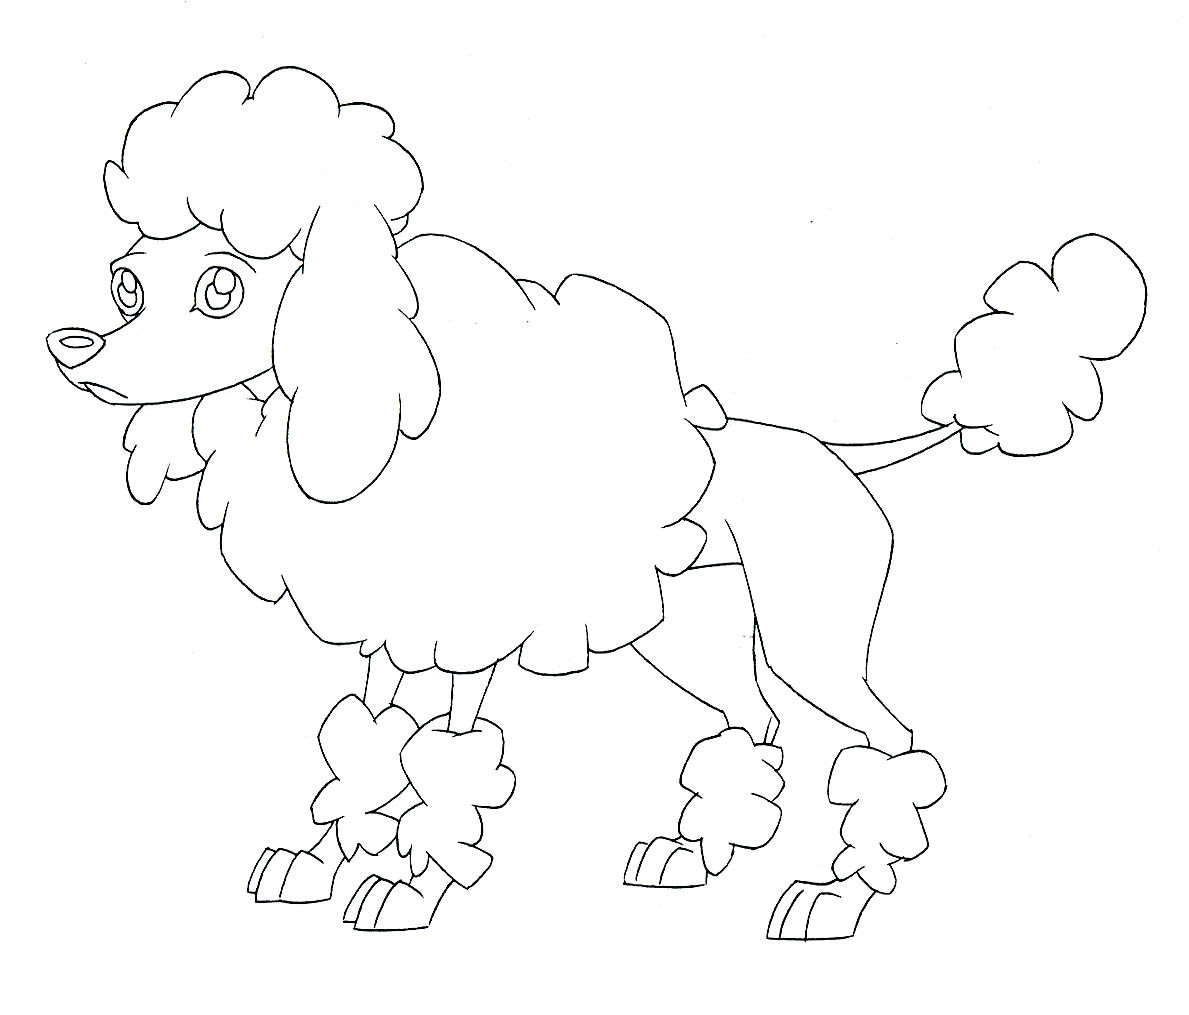 1189x1015 Poodle Coloring Pages Fair Colouring